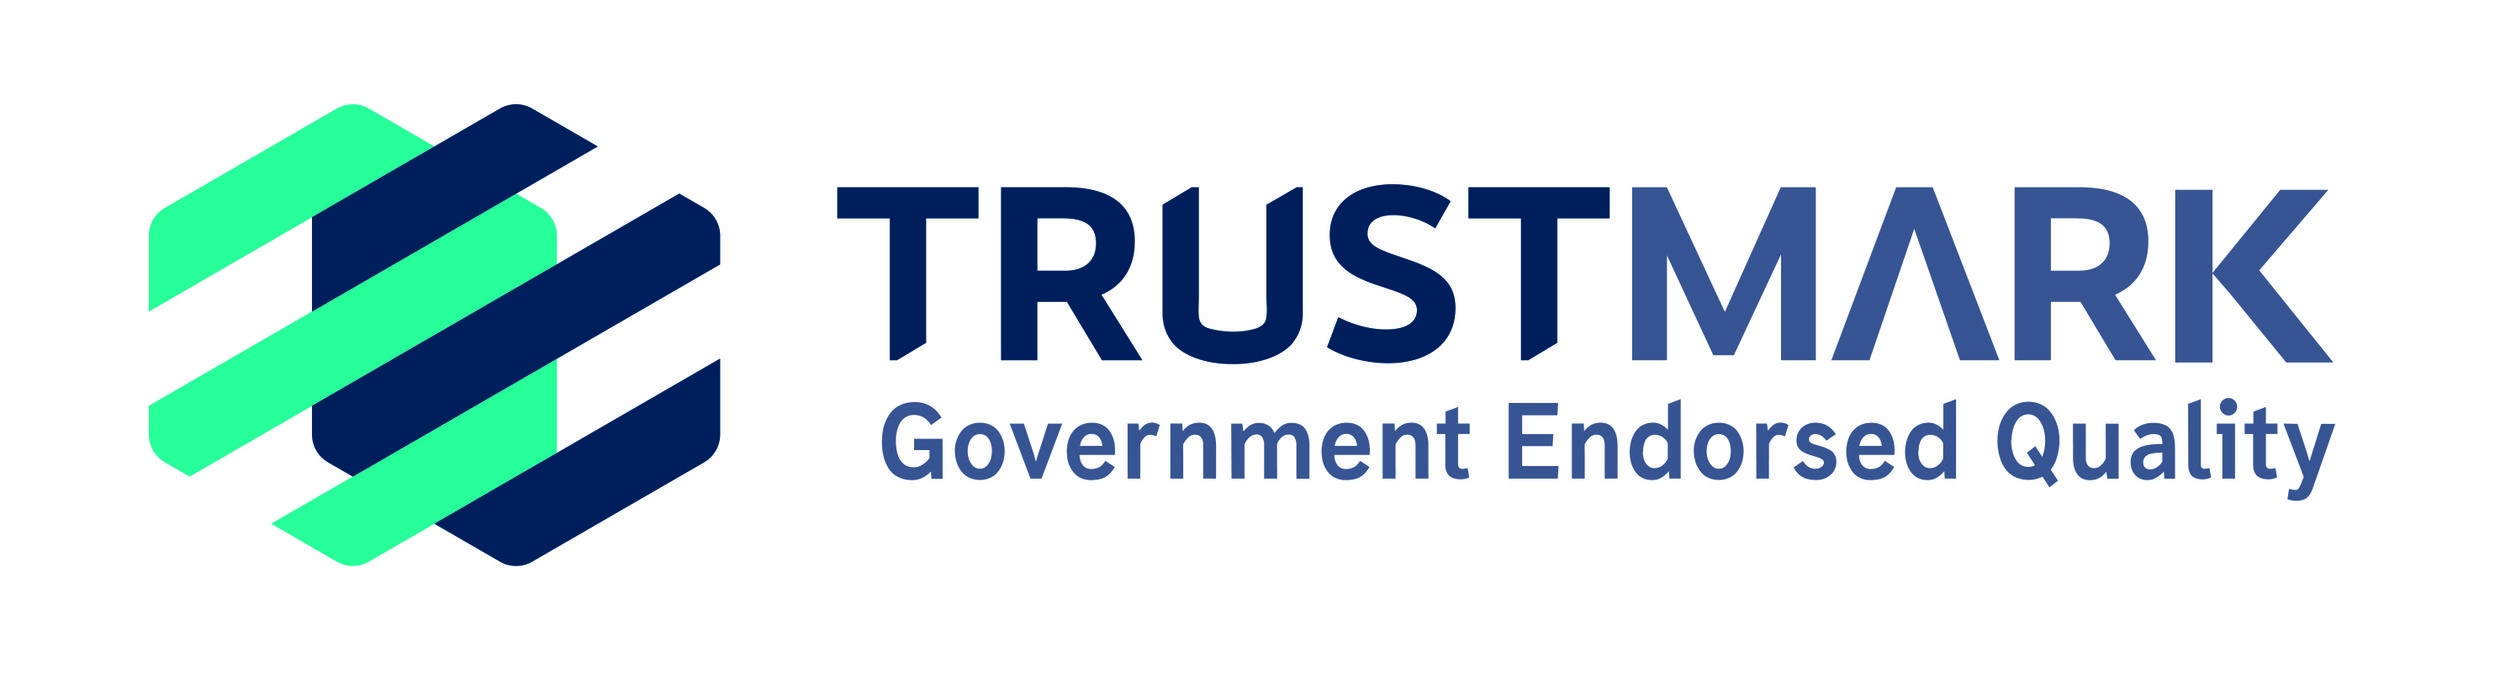 trustmark-logo-rgb_4oct2018.jpg